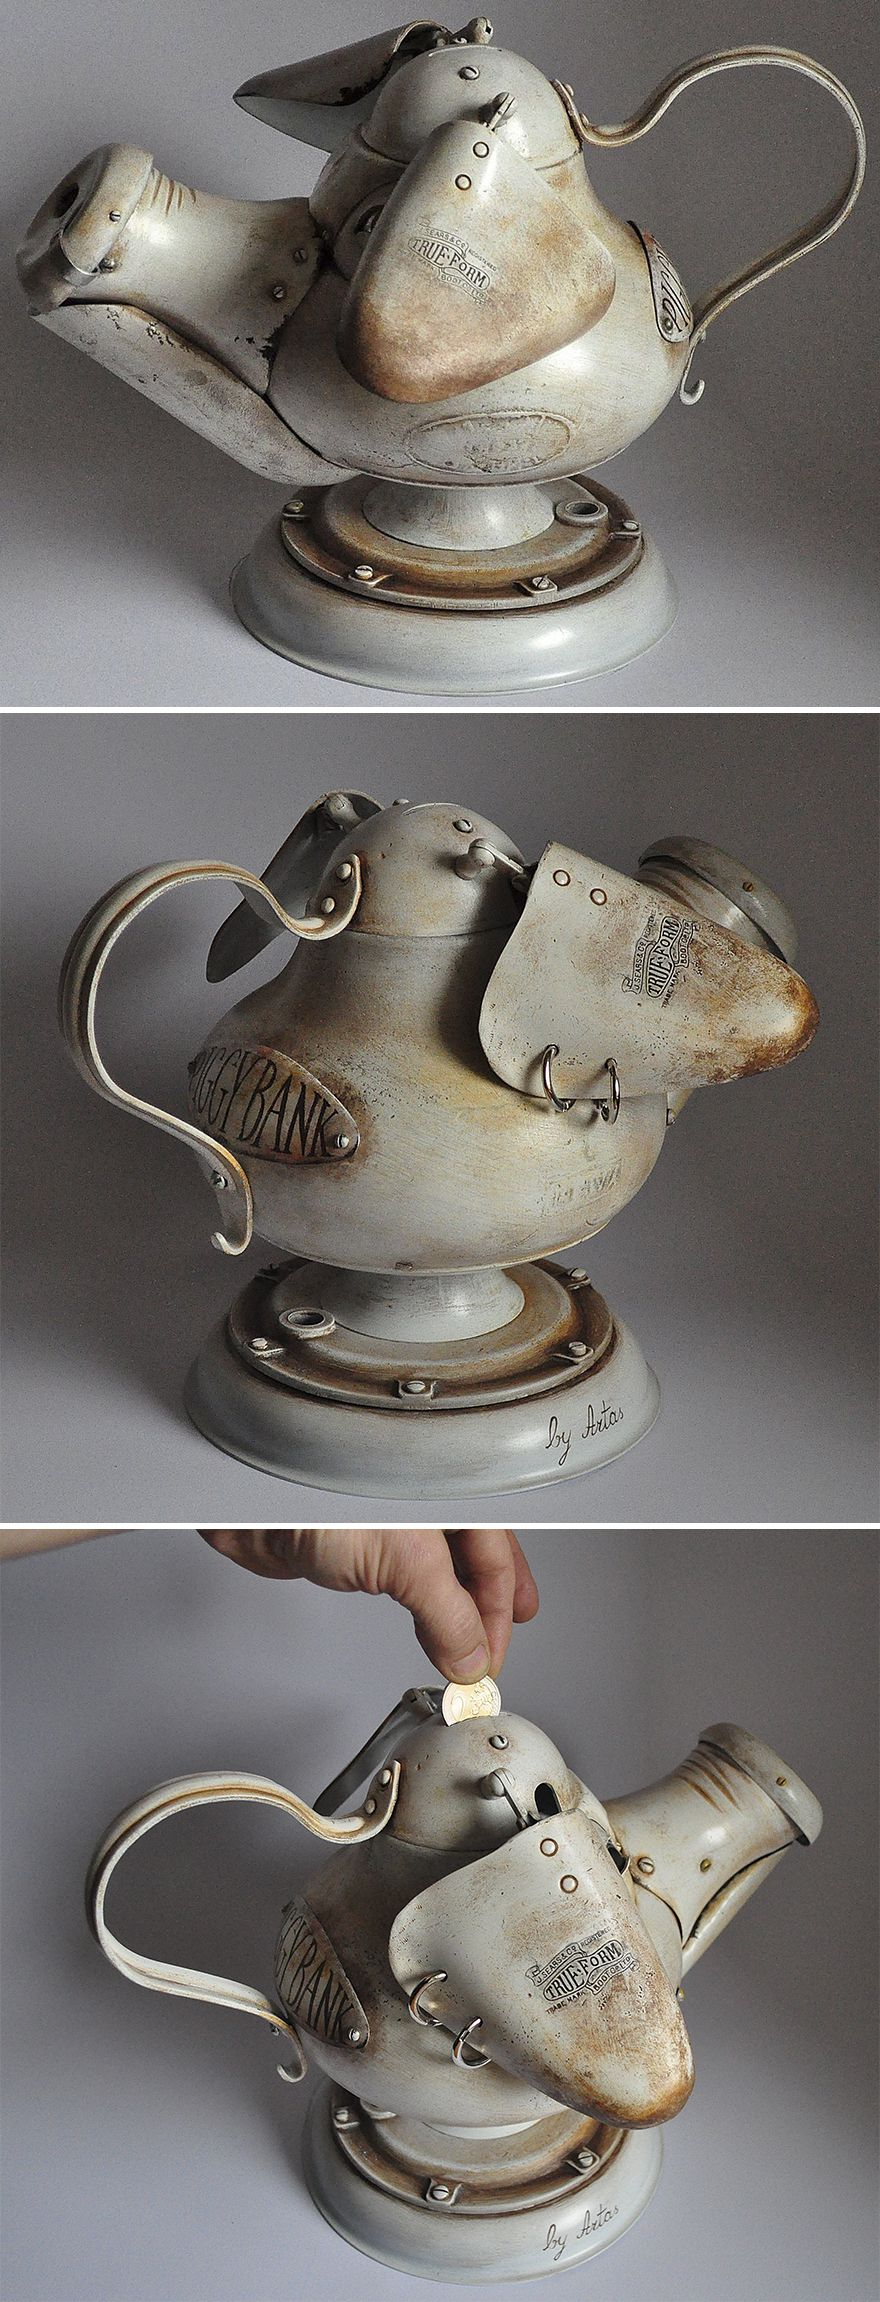 Steampunk Sculptures Made From Trash By Arturas Tamasauskas 5